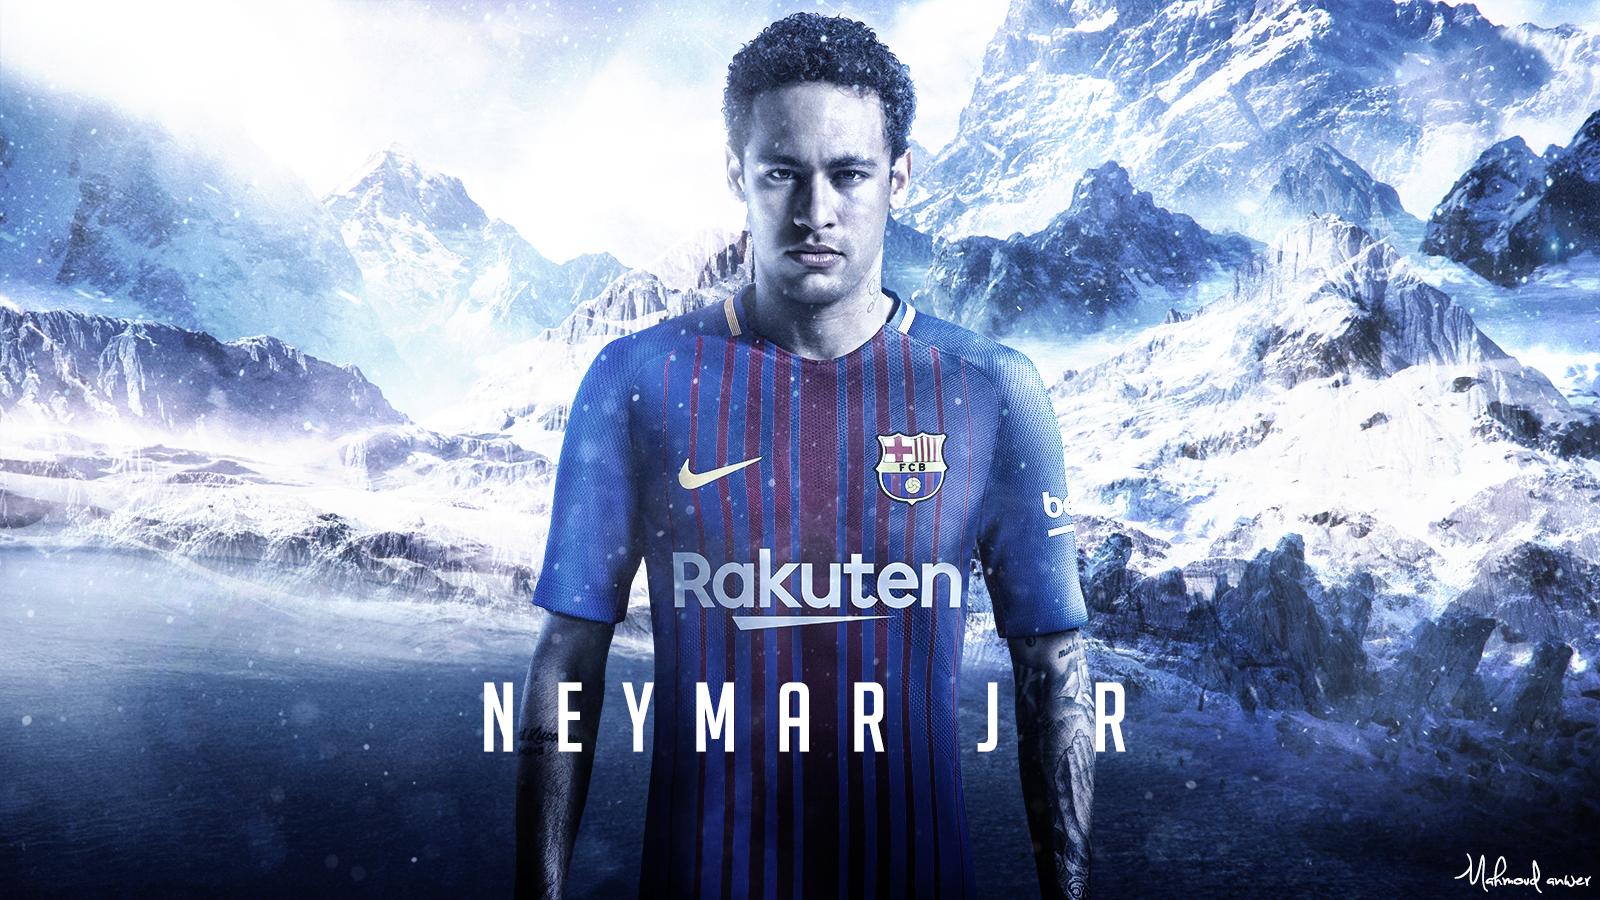 Neymar JR 2017 Wallpaper by mahmoddesigner 1600x900